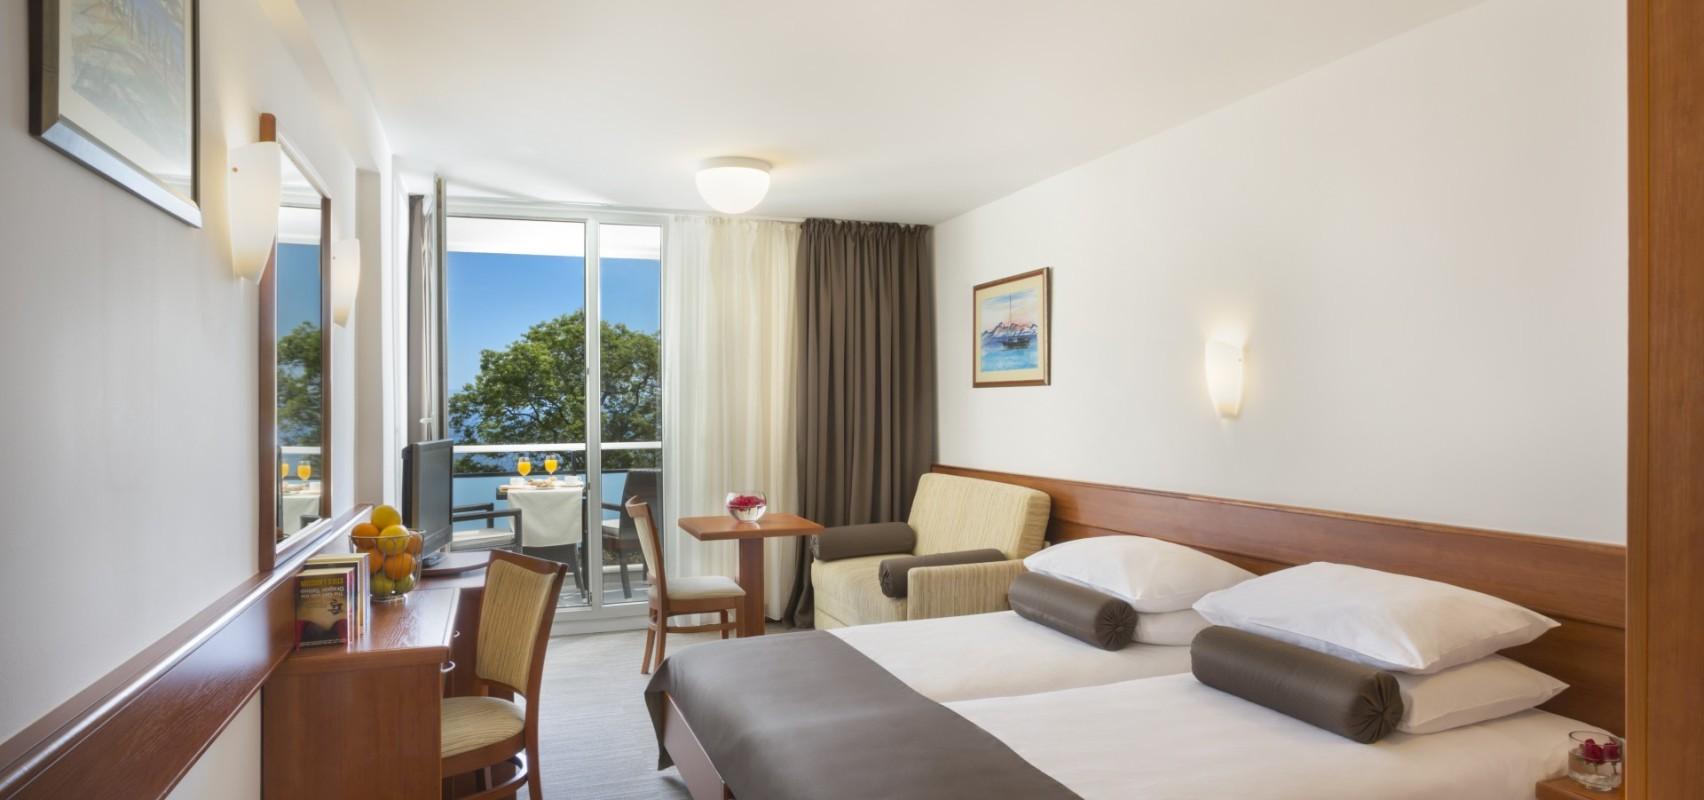 Hotel Marina Moscenicka Draga Near Opatija  U2013 Remisens Hotels